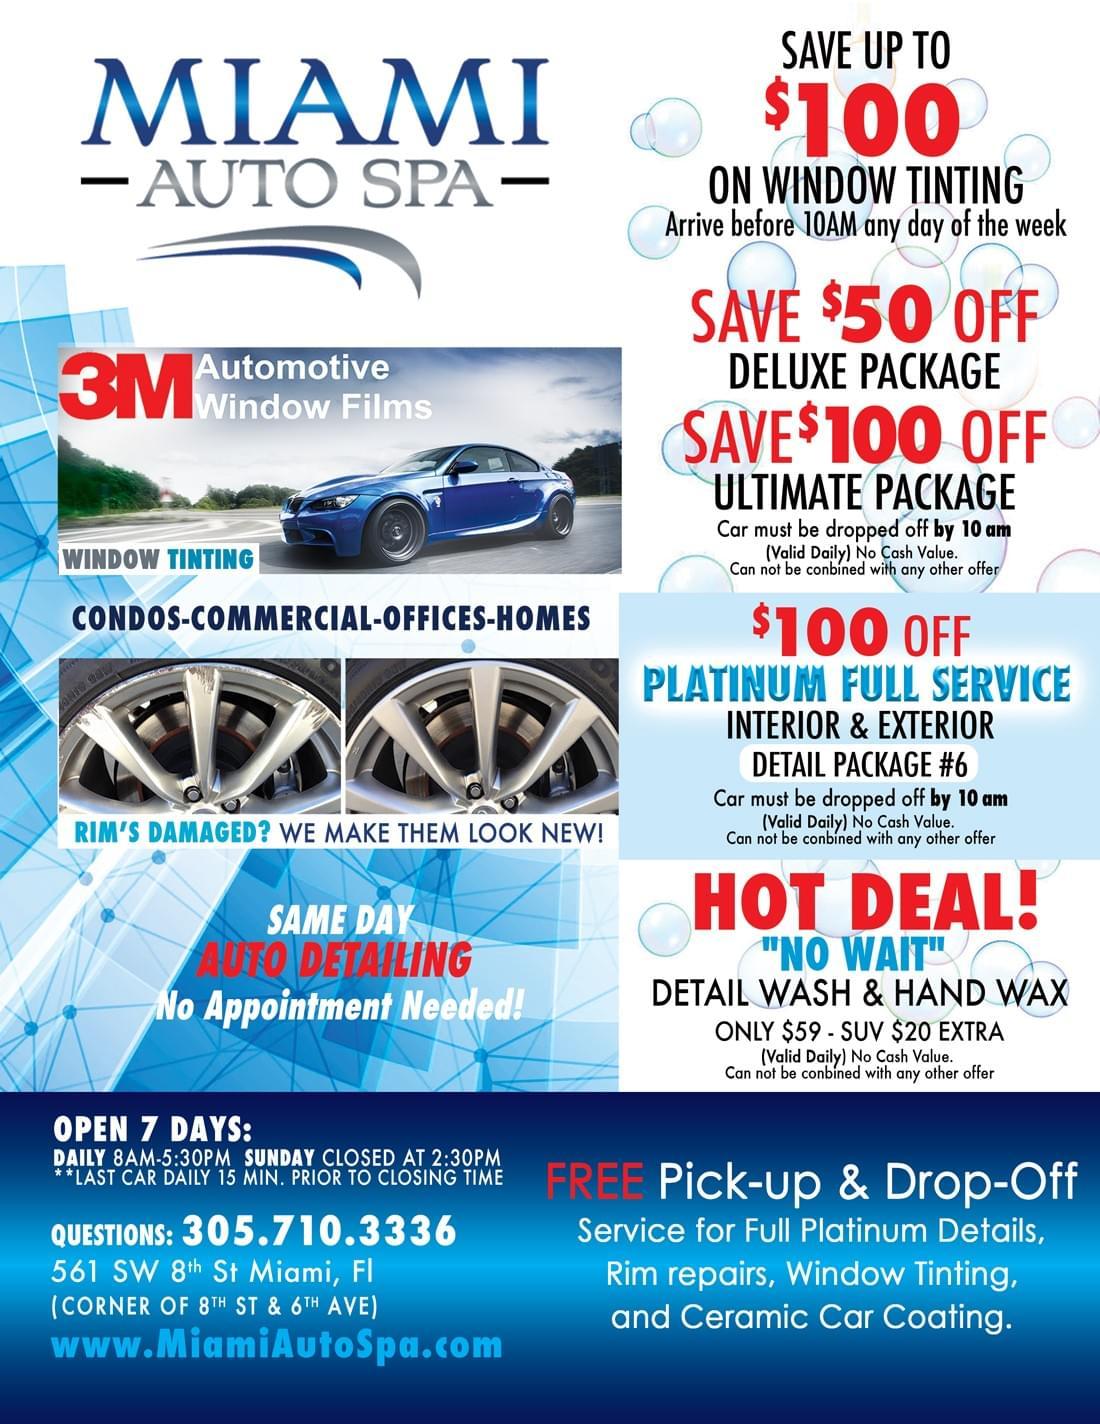 Car Wash Deals >> Car Detailing Coupons Miami 33131 Deals On Auto Detailing